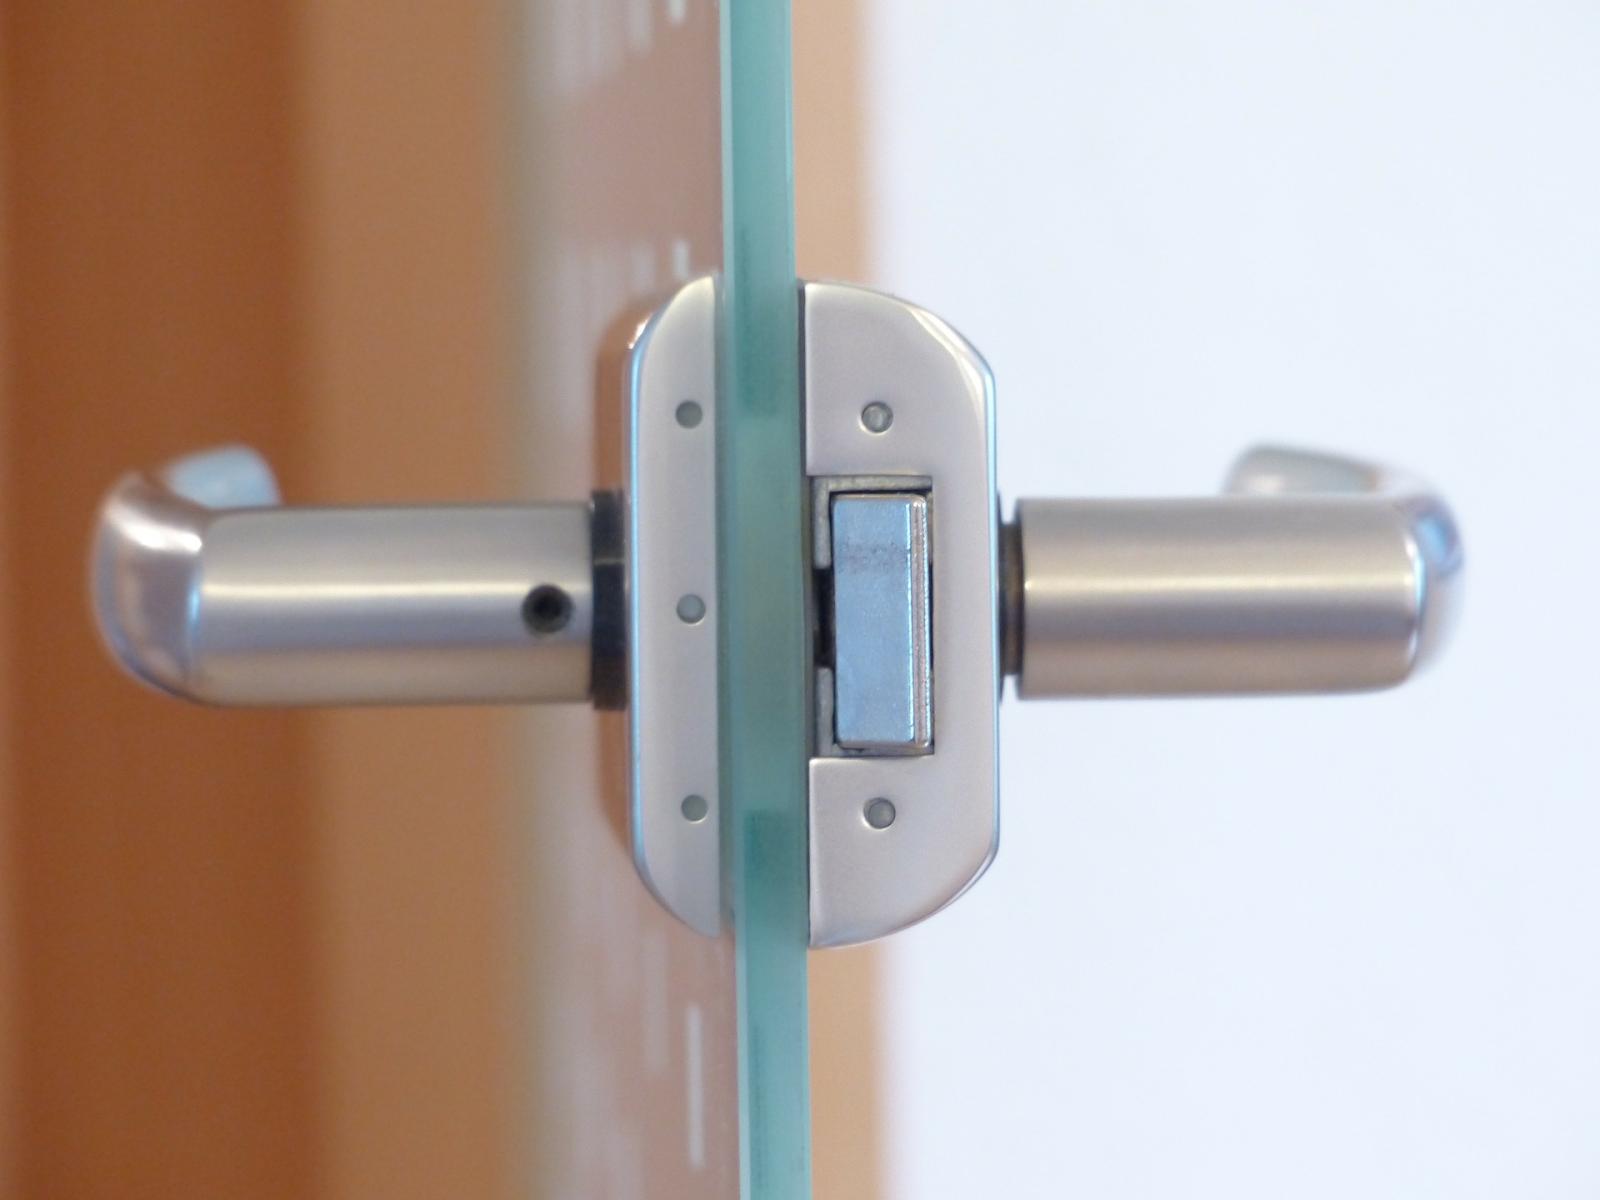 Fixing Loose Problem Door Handle Lock Take It Easy With Heleh